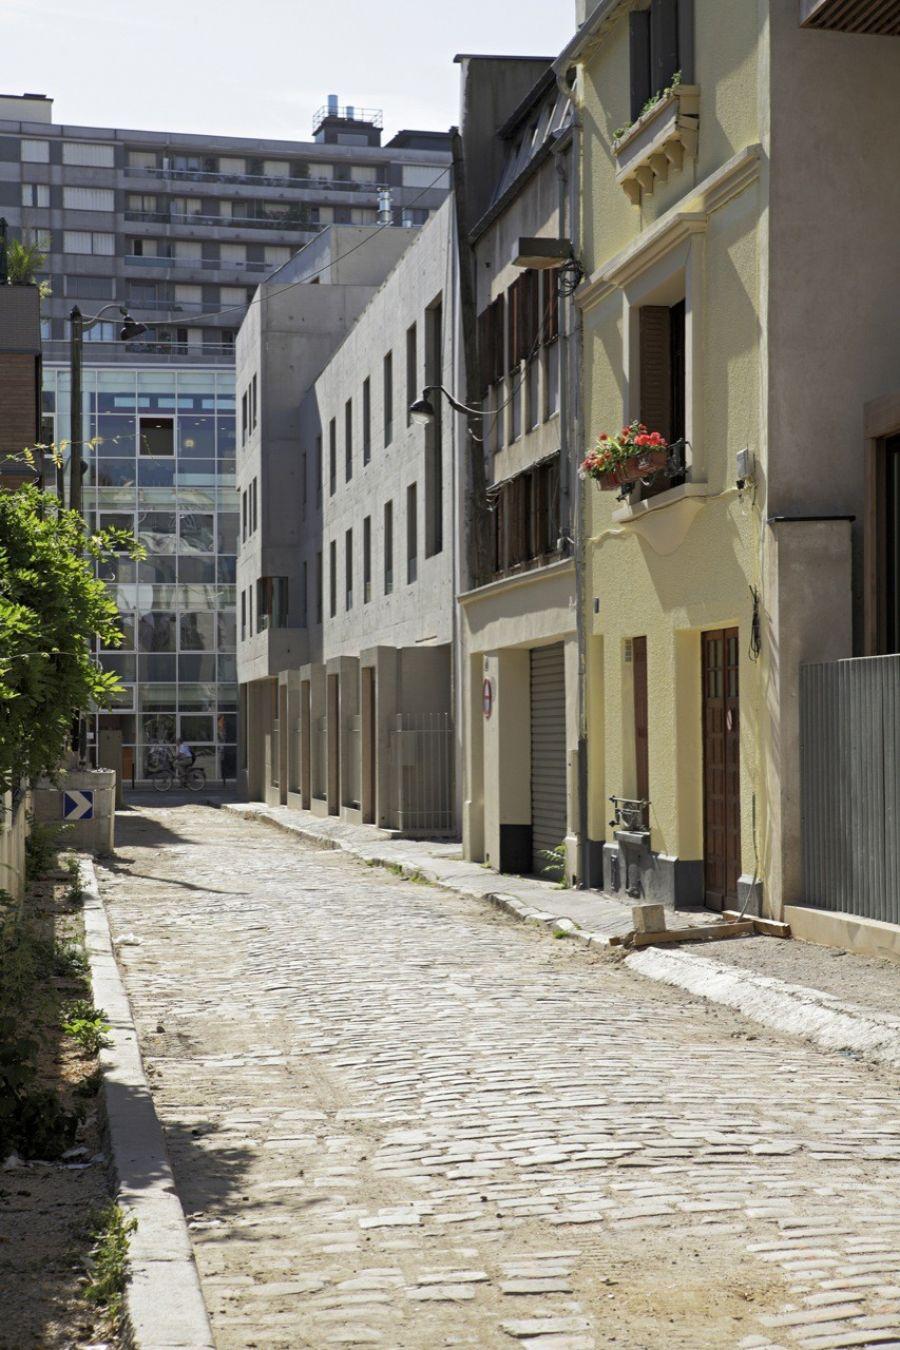 Immeuble rue du Nord - Arch. Charles-Henri Tachon - Photo : Kristen Pelou